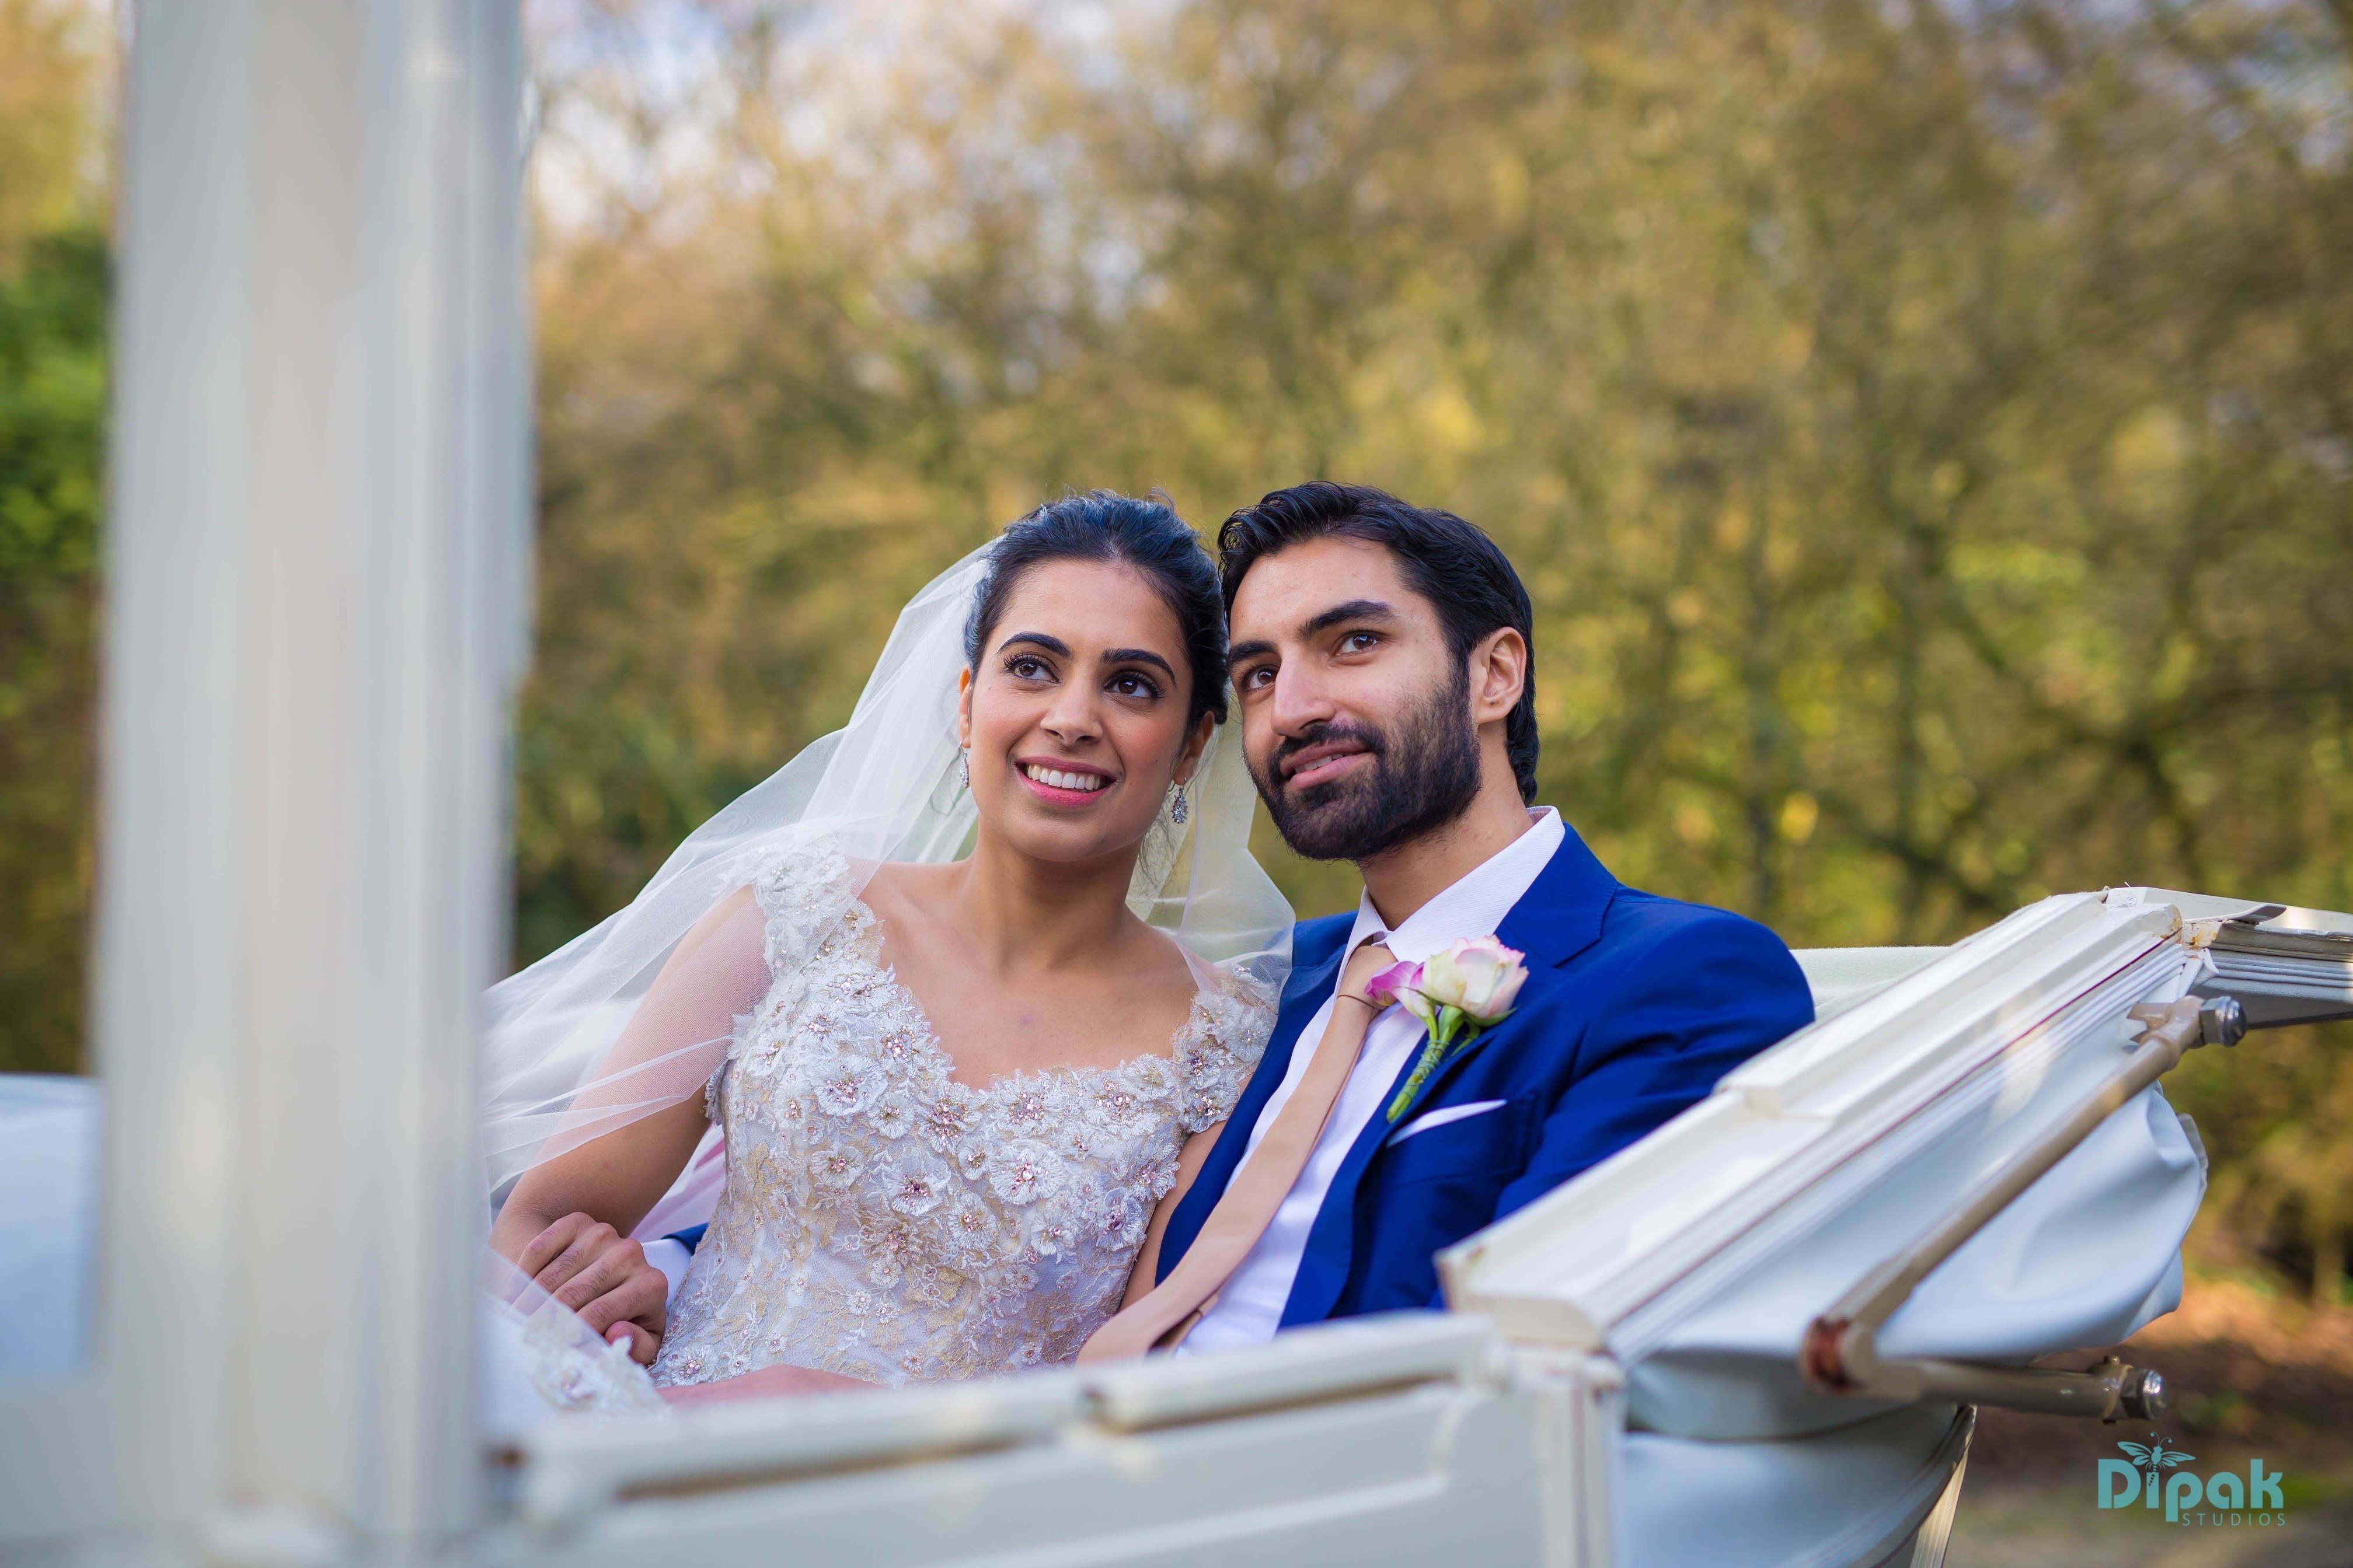 the perfect couple!:dipak colour lab pvt ltd, sabyasachi couture pvt ltd, anushree reddy